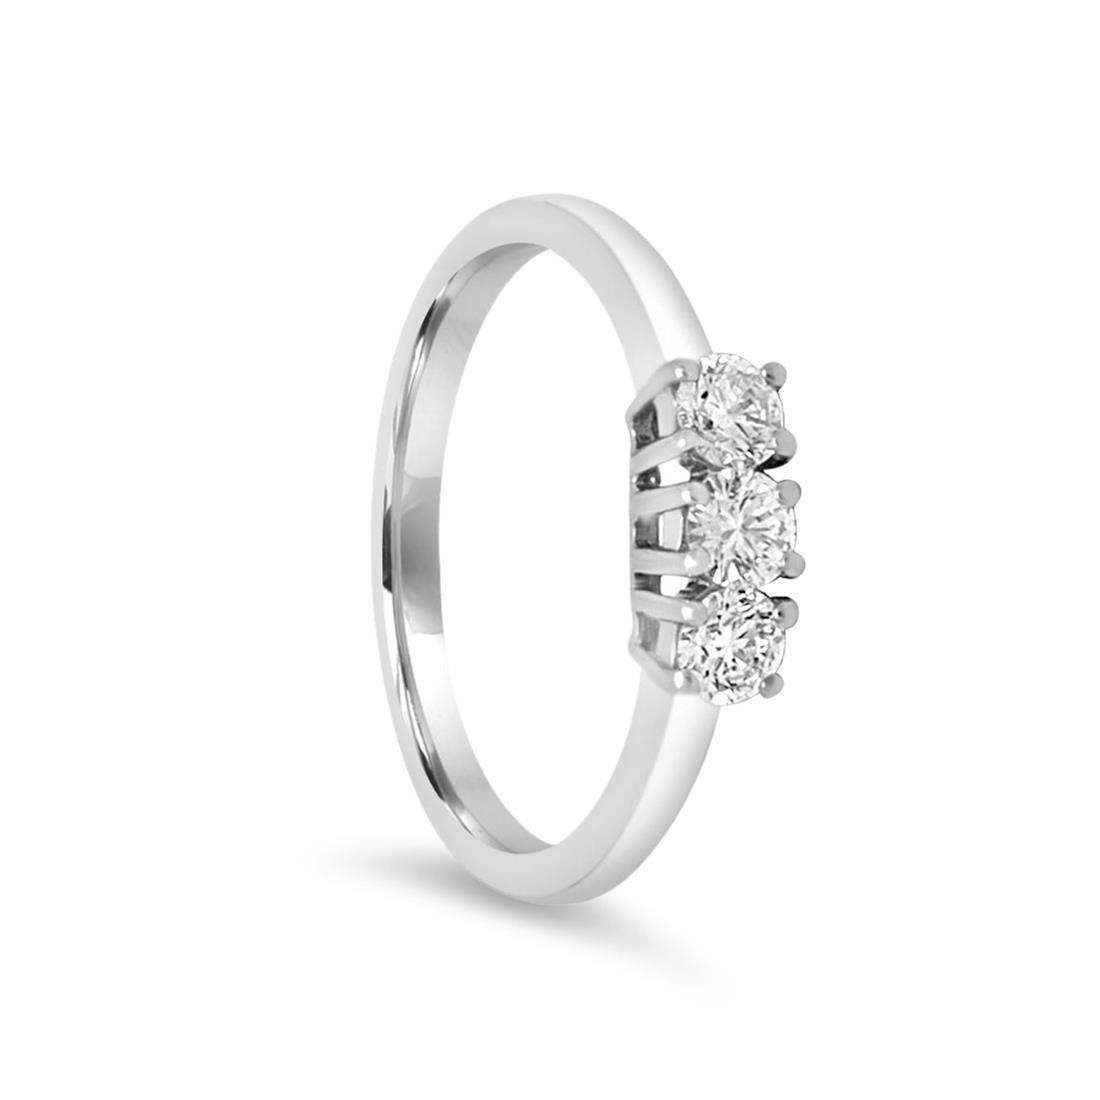 Anillo de oro blanco con diamantes de 0,45 ct - ALFIERI & ST. JOHN